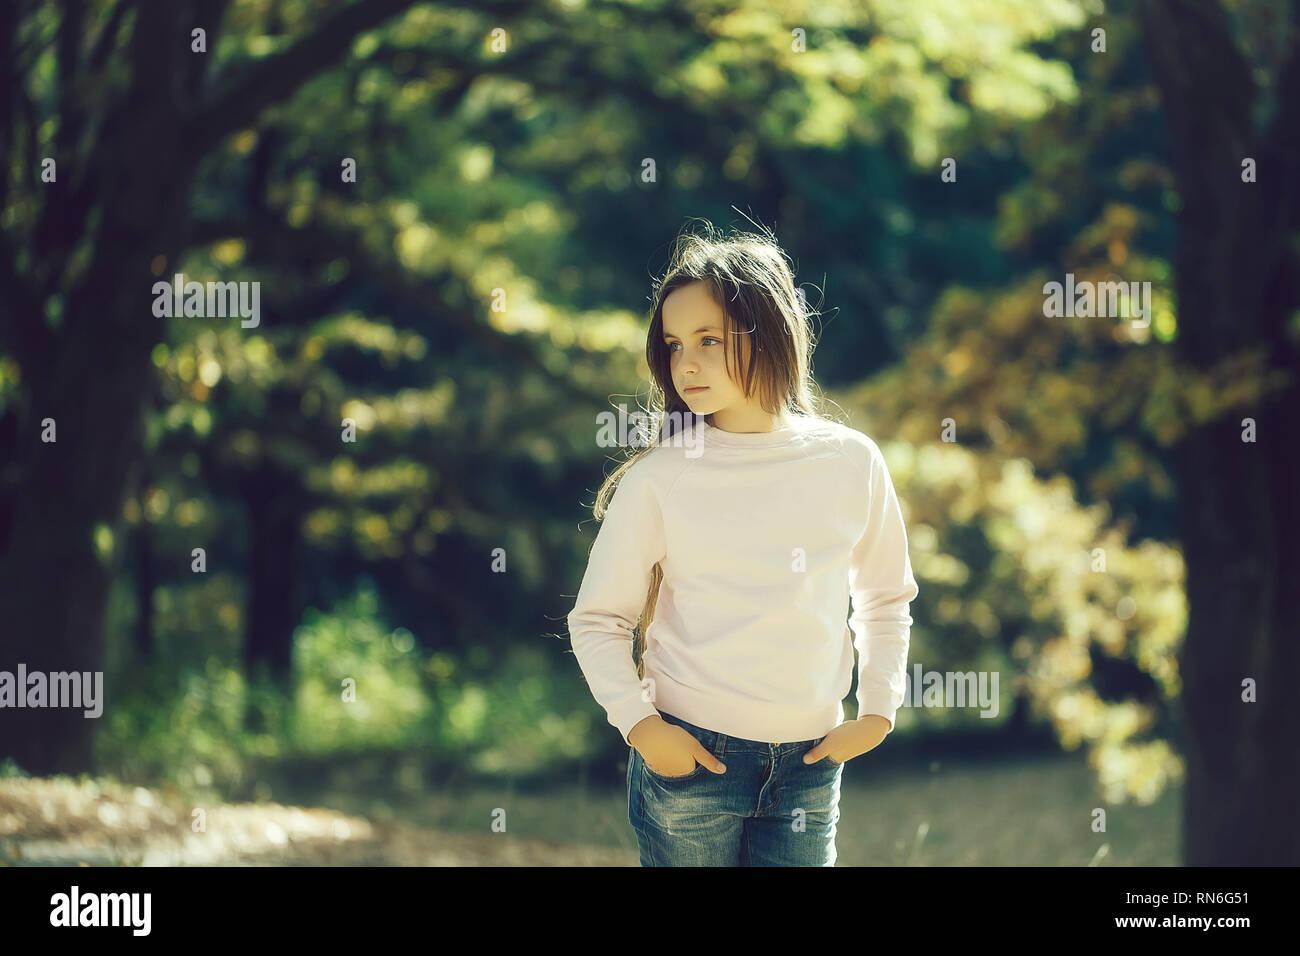 Cute girl preteen  - Stock Image